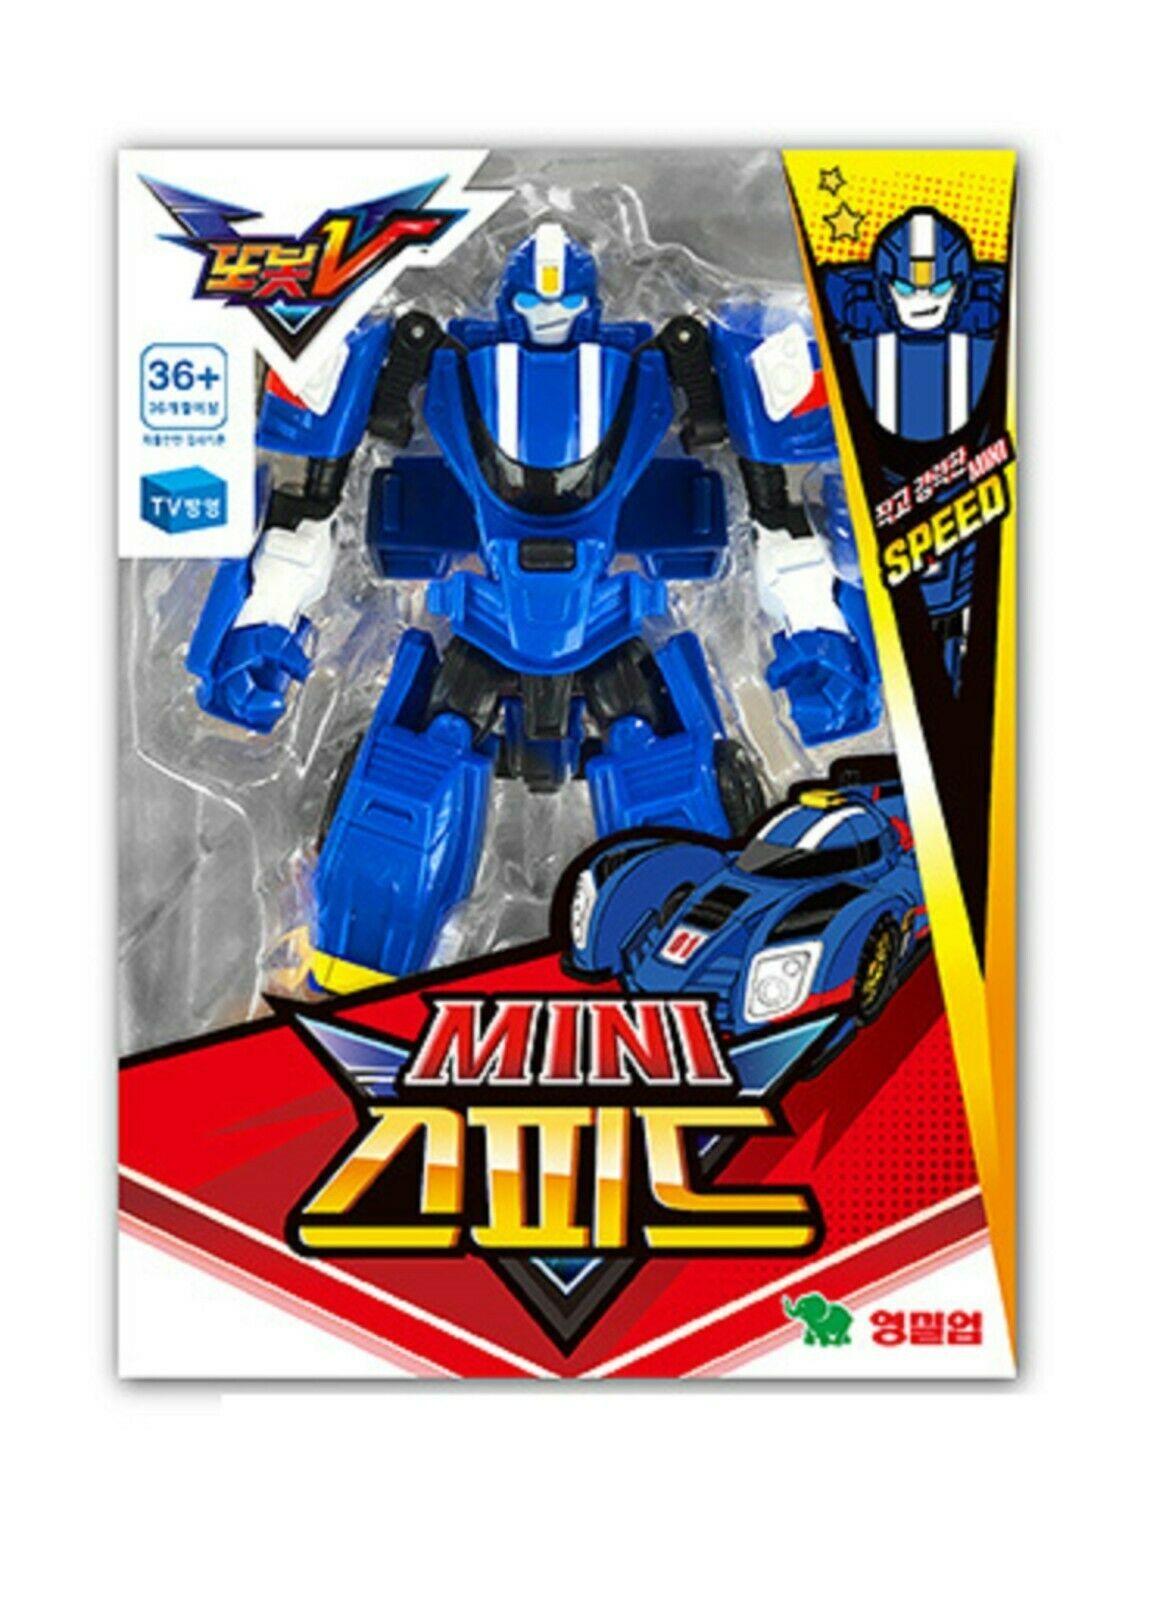 Tobot Mini Speed Toy Robot Transforming Transformation Action Figure Figurine